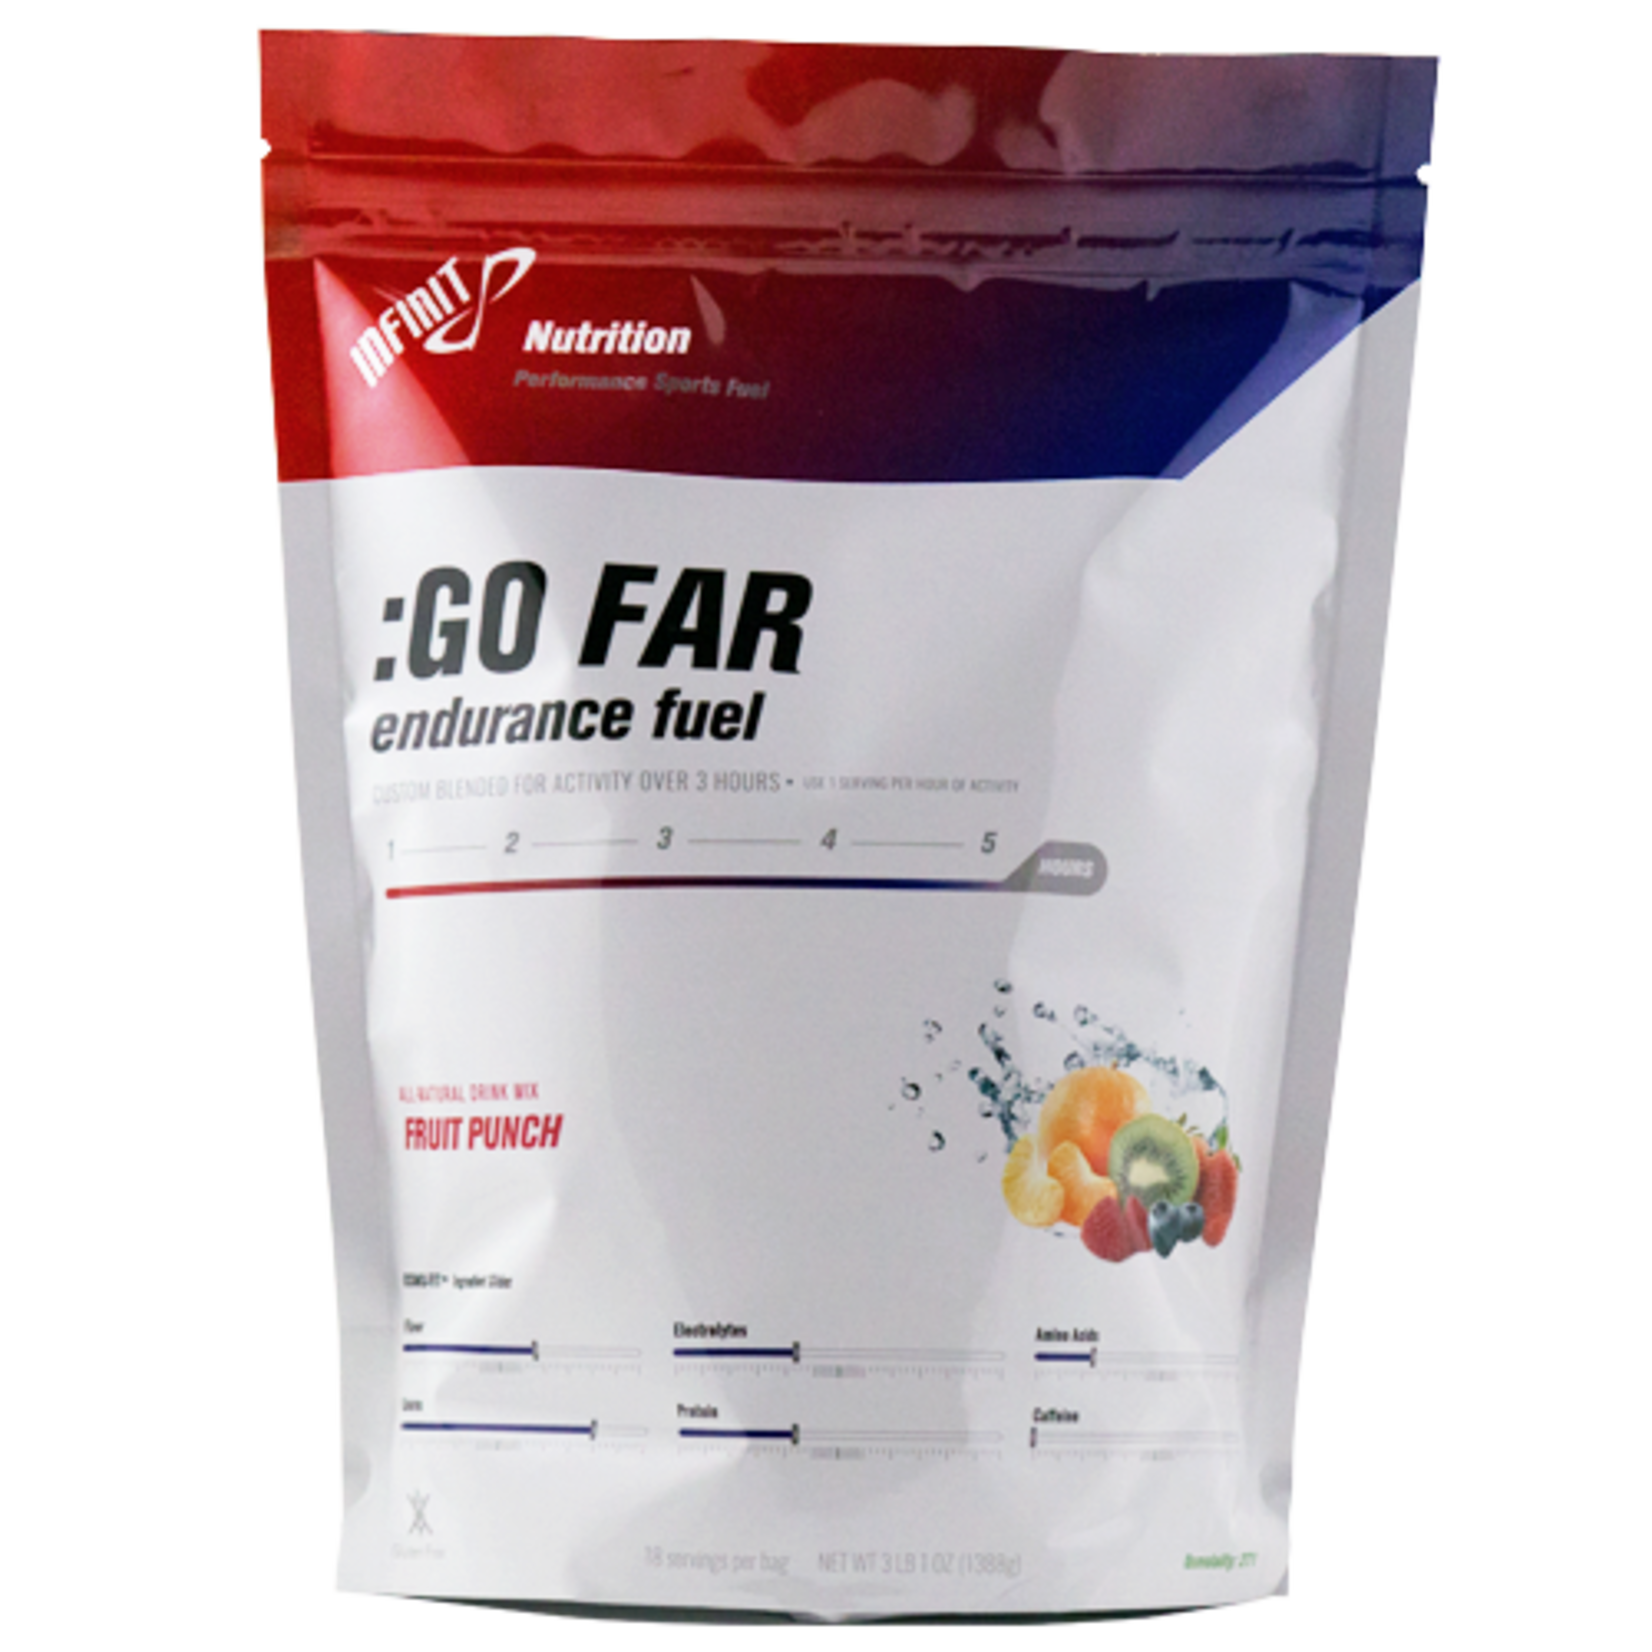 INFINIT NUTRITION LLC Go Far Endurance Fuel Fruit Punch